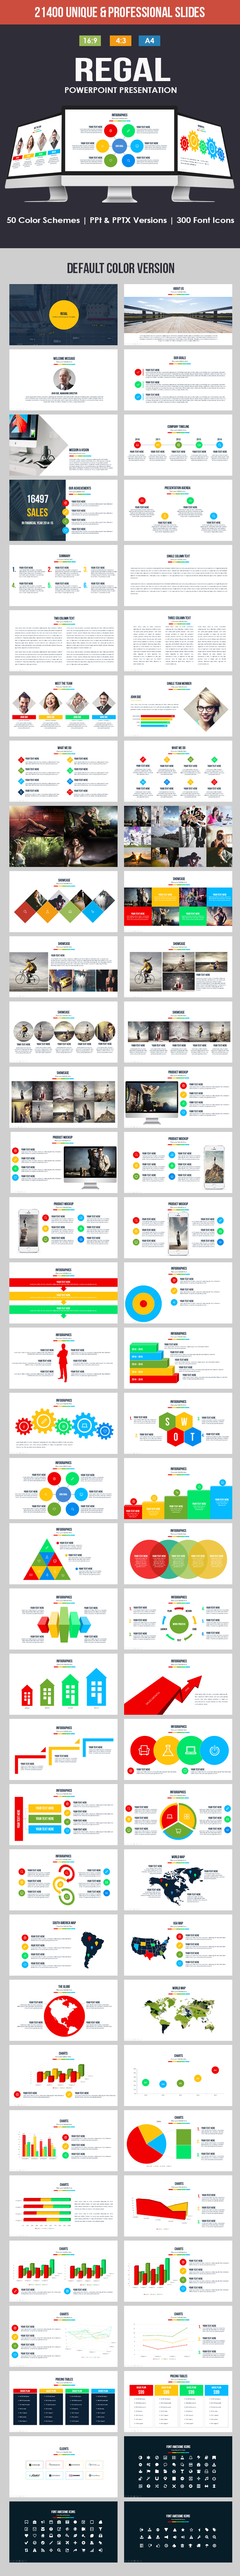 Regal PowerPoint Template - Business PowerPoint Templates